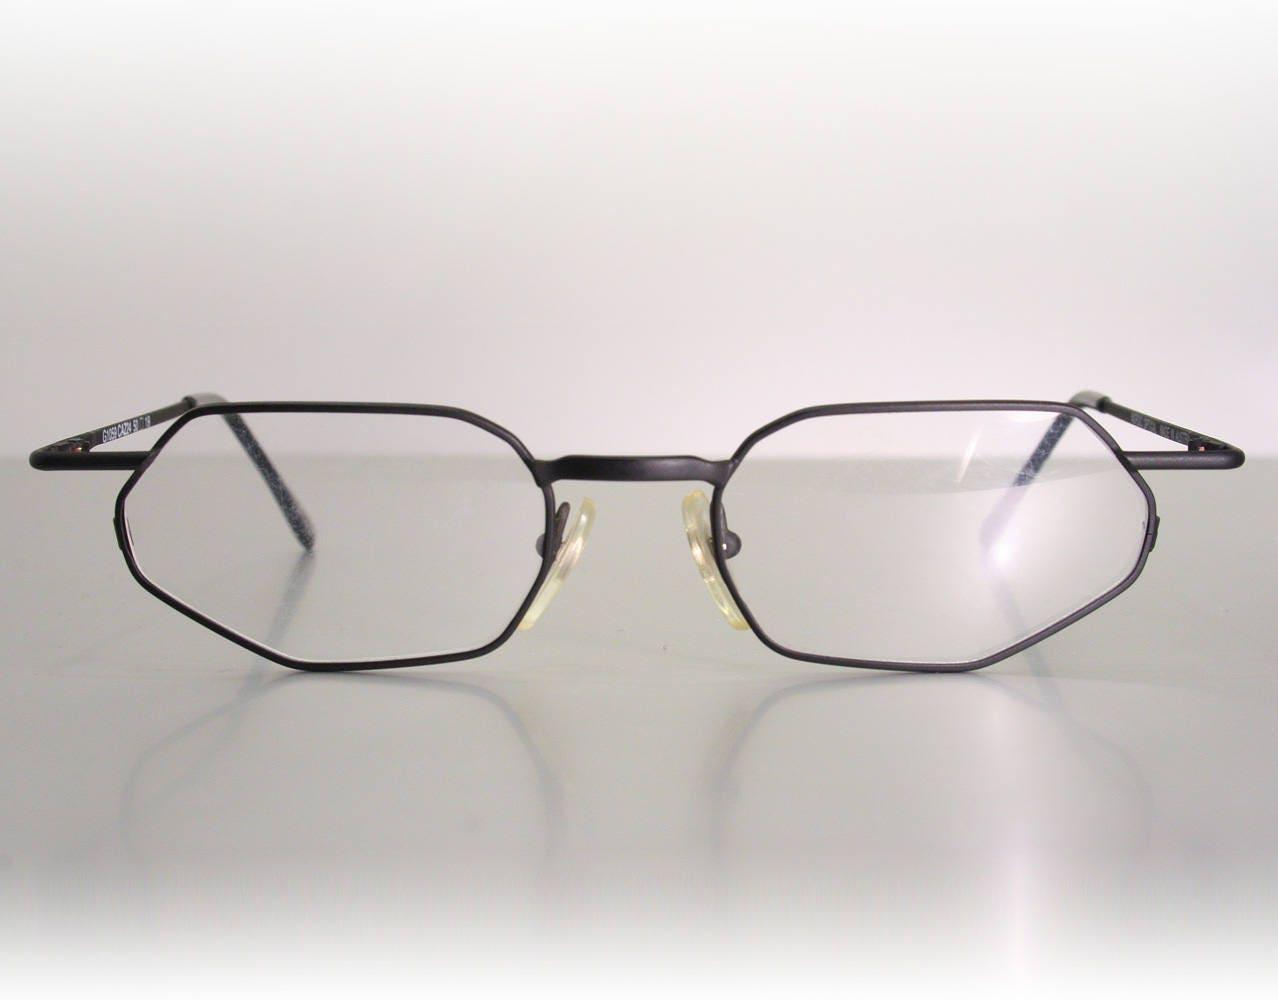 Matte Black NORDIC OPTICAL Men\'s Angular Eyeglass Frames NOS Old ...